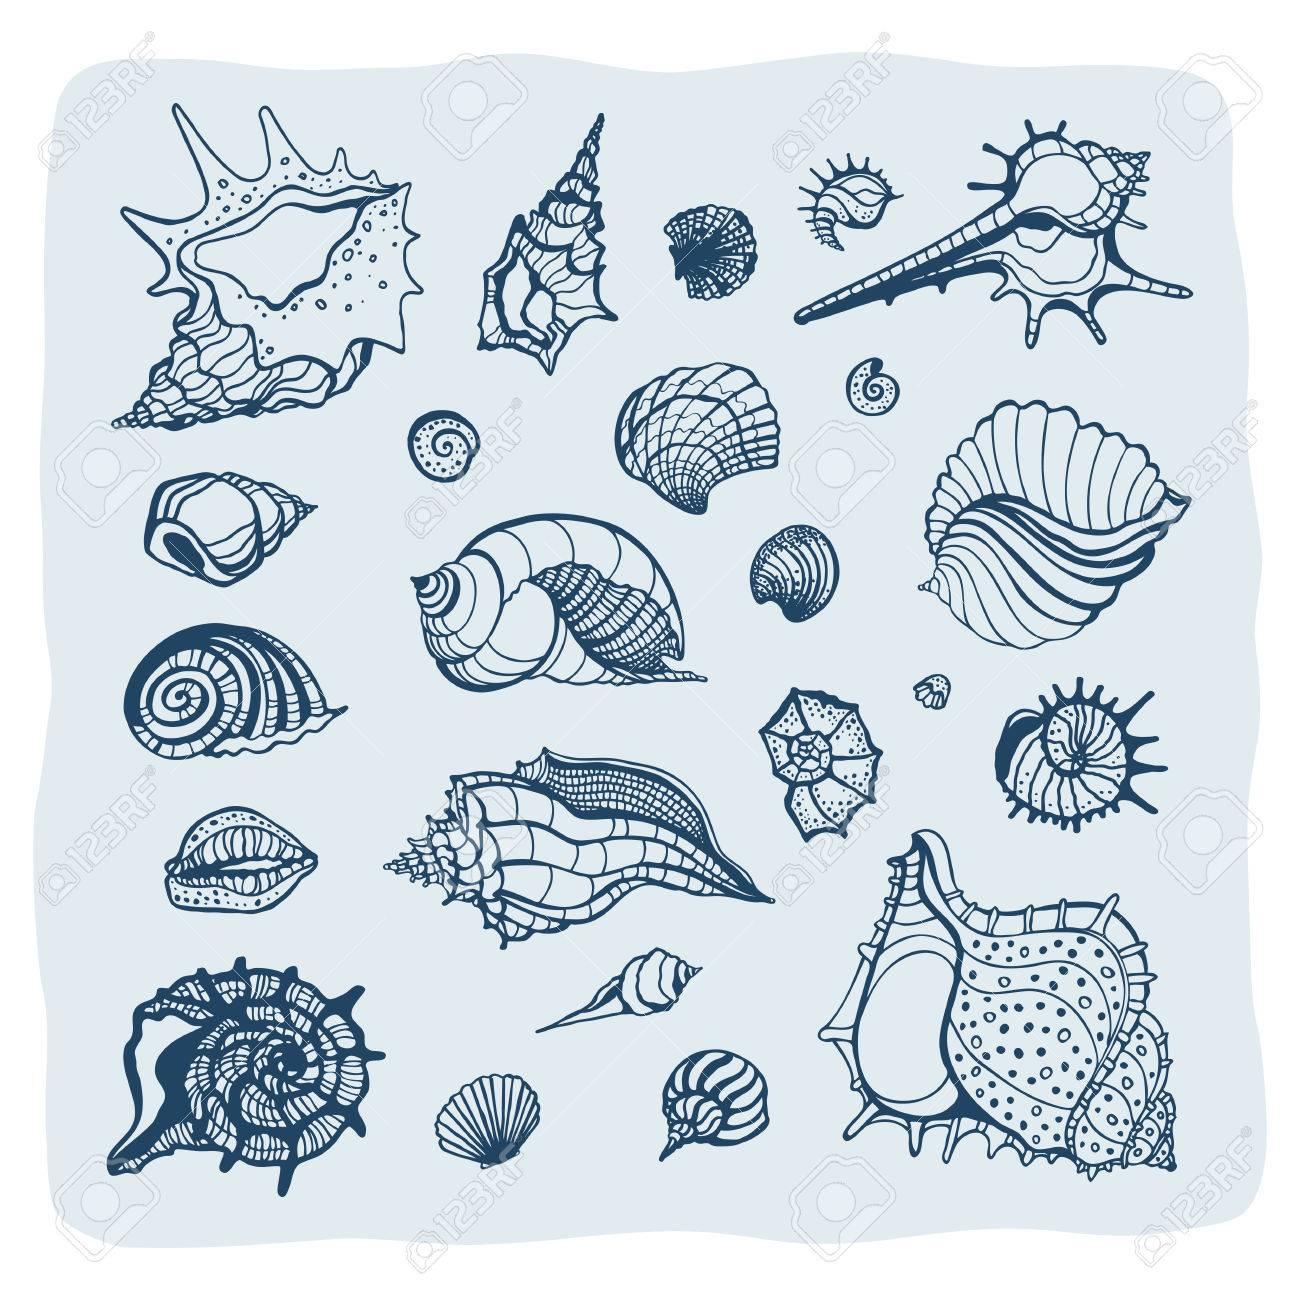 1300x1300 Collection Of Seashells. Hand Drawn Vector Illustration. Sea